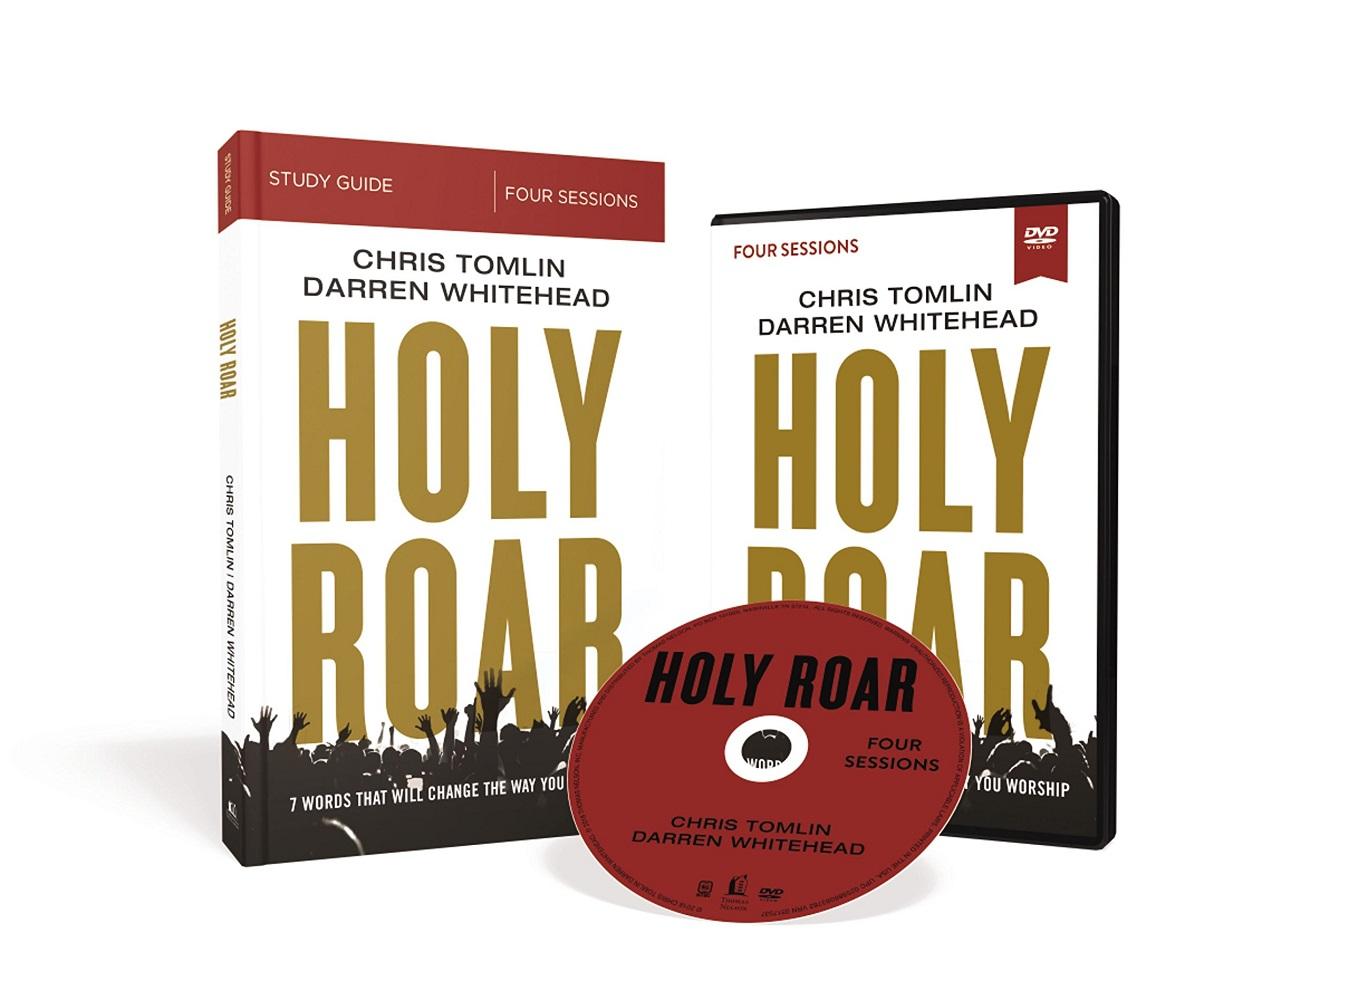 Chris Tomlin - A Holy Roar